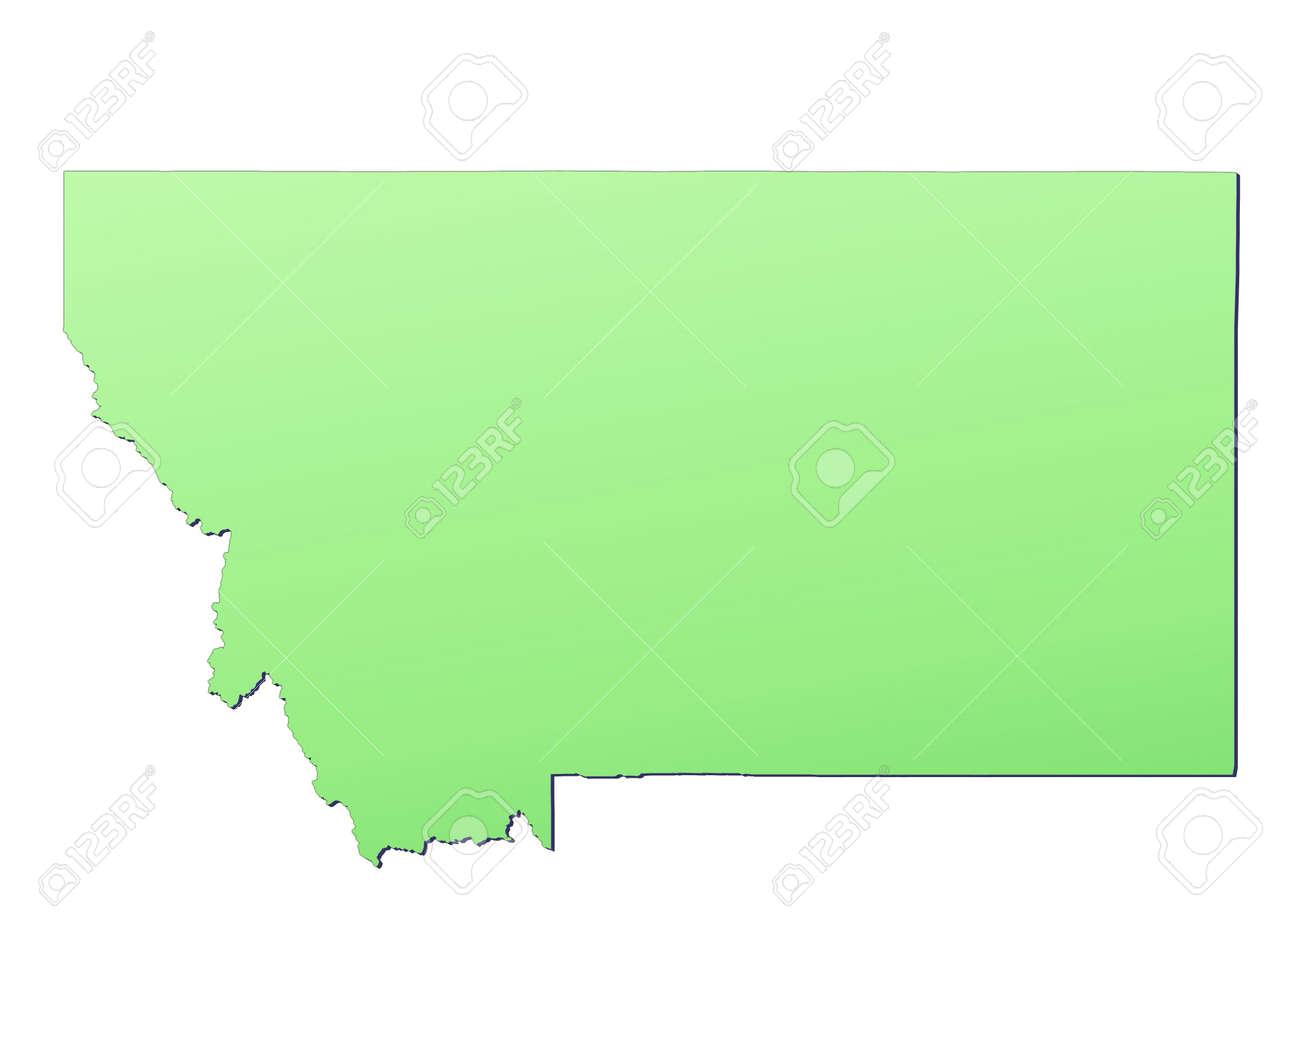 Montana USA Map Filled With Light Green Gradient High - Montana usa map